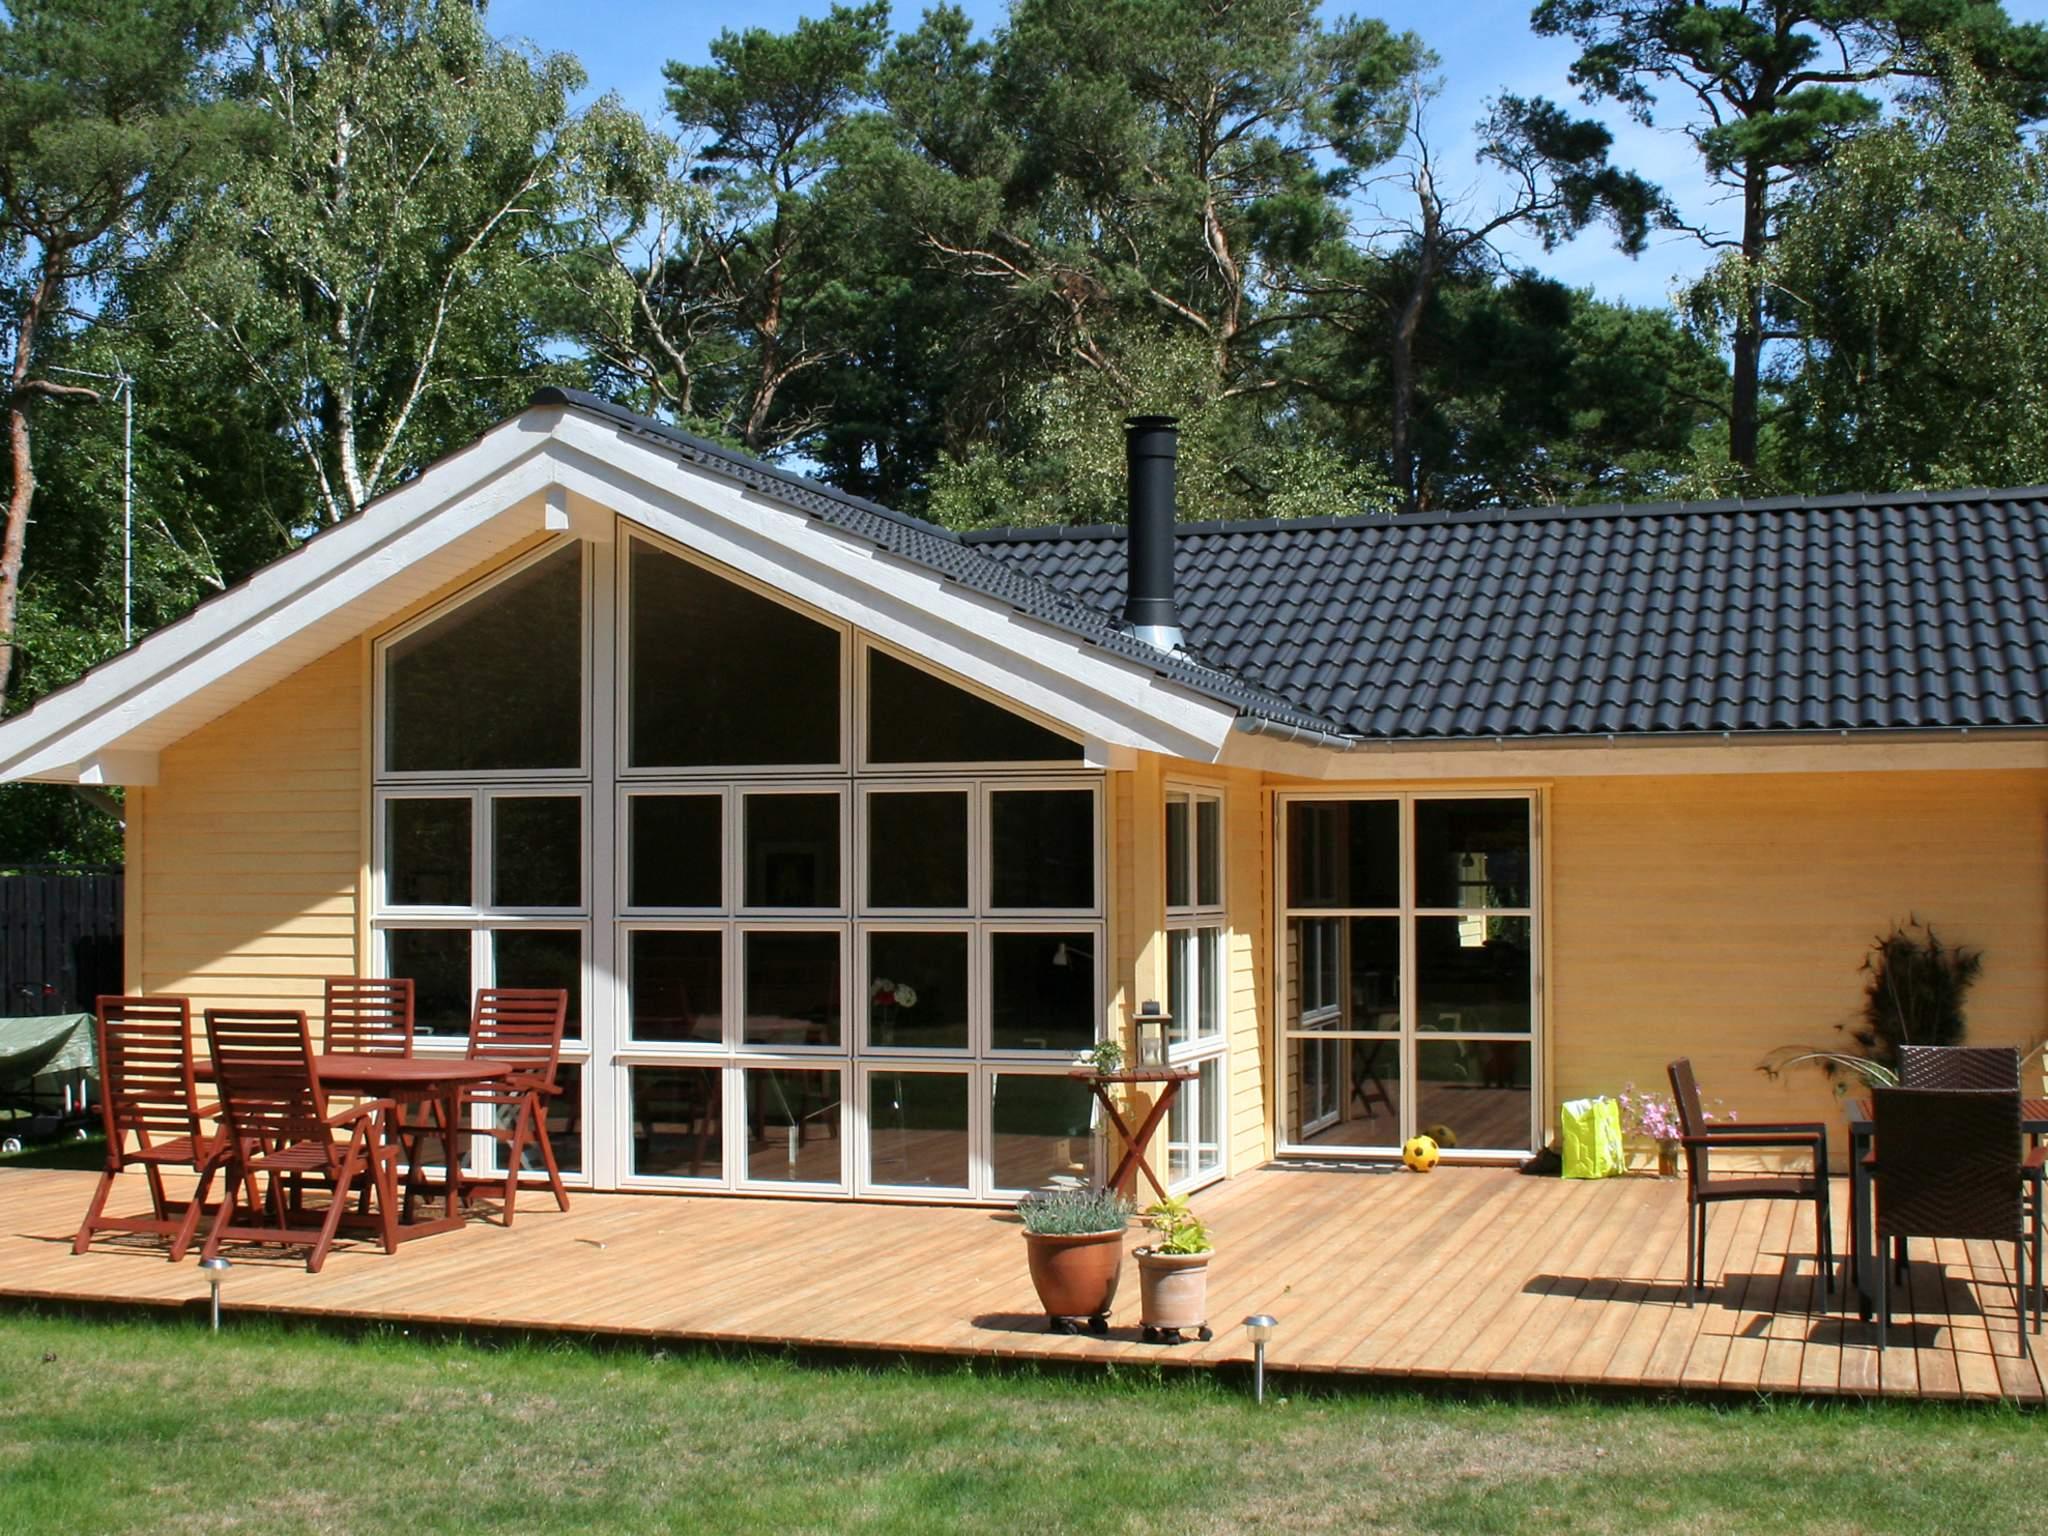 Ferienhaus Balka Strand (312137), Balke, , Bornholm, Dänemark, Bild 14